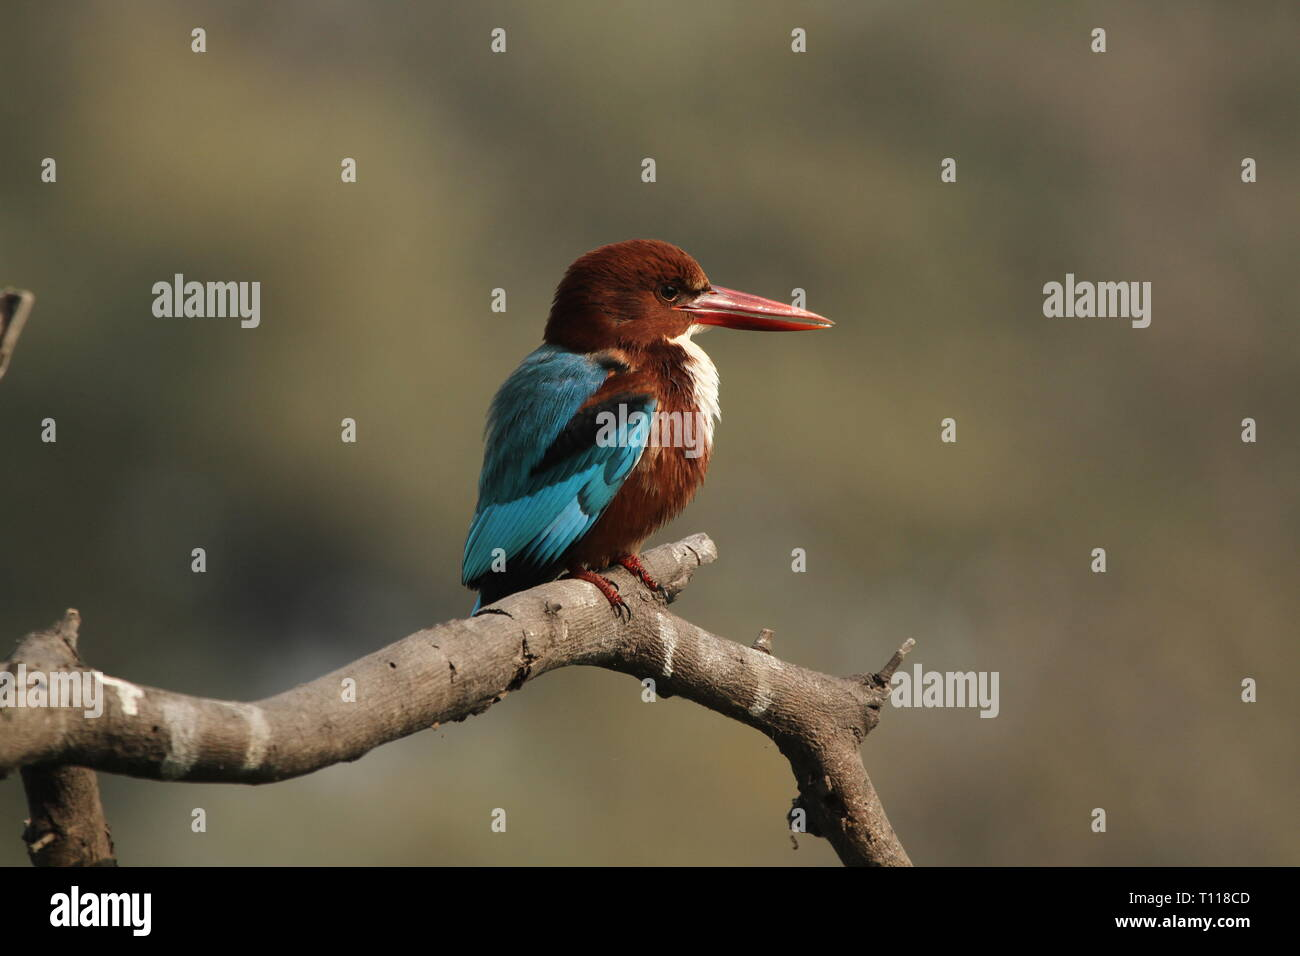 White-throated kingfisher on tree in Keoladeo National Park, Bharatpur - Stock Image